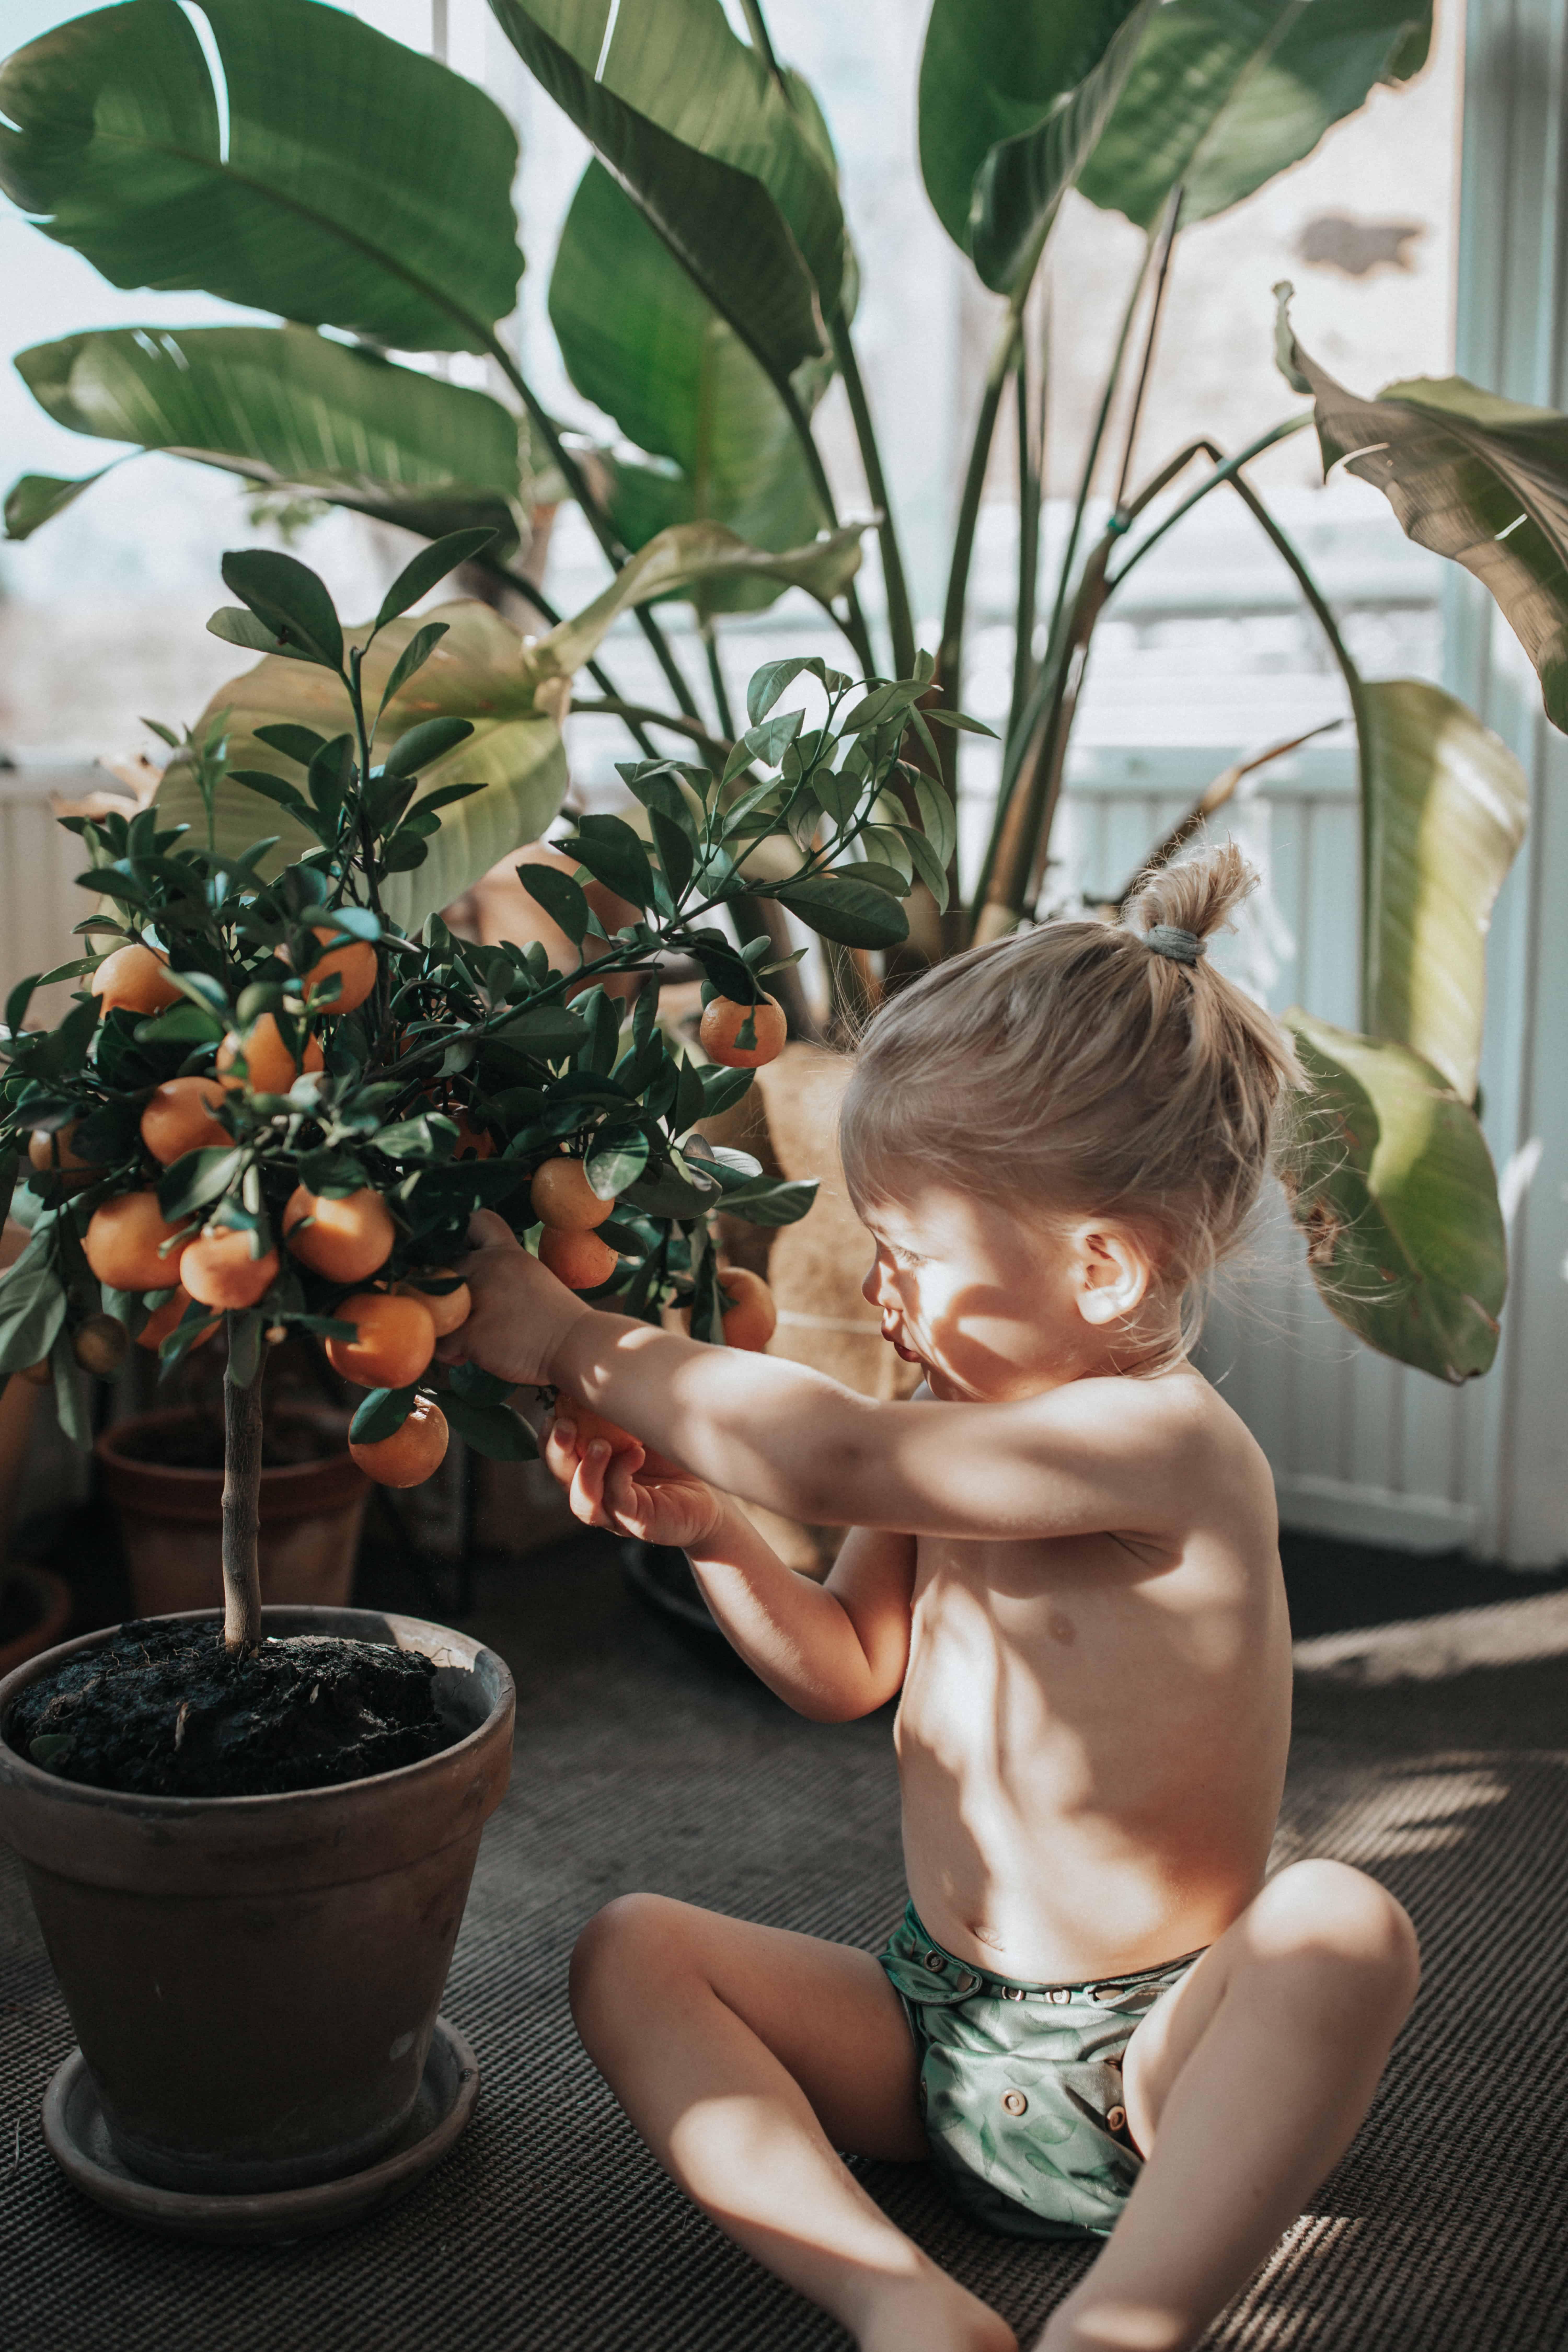 Boy with cloth diaper twigs